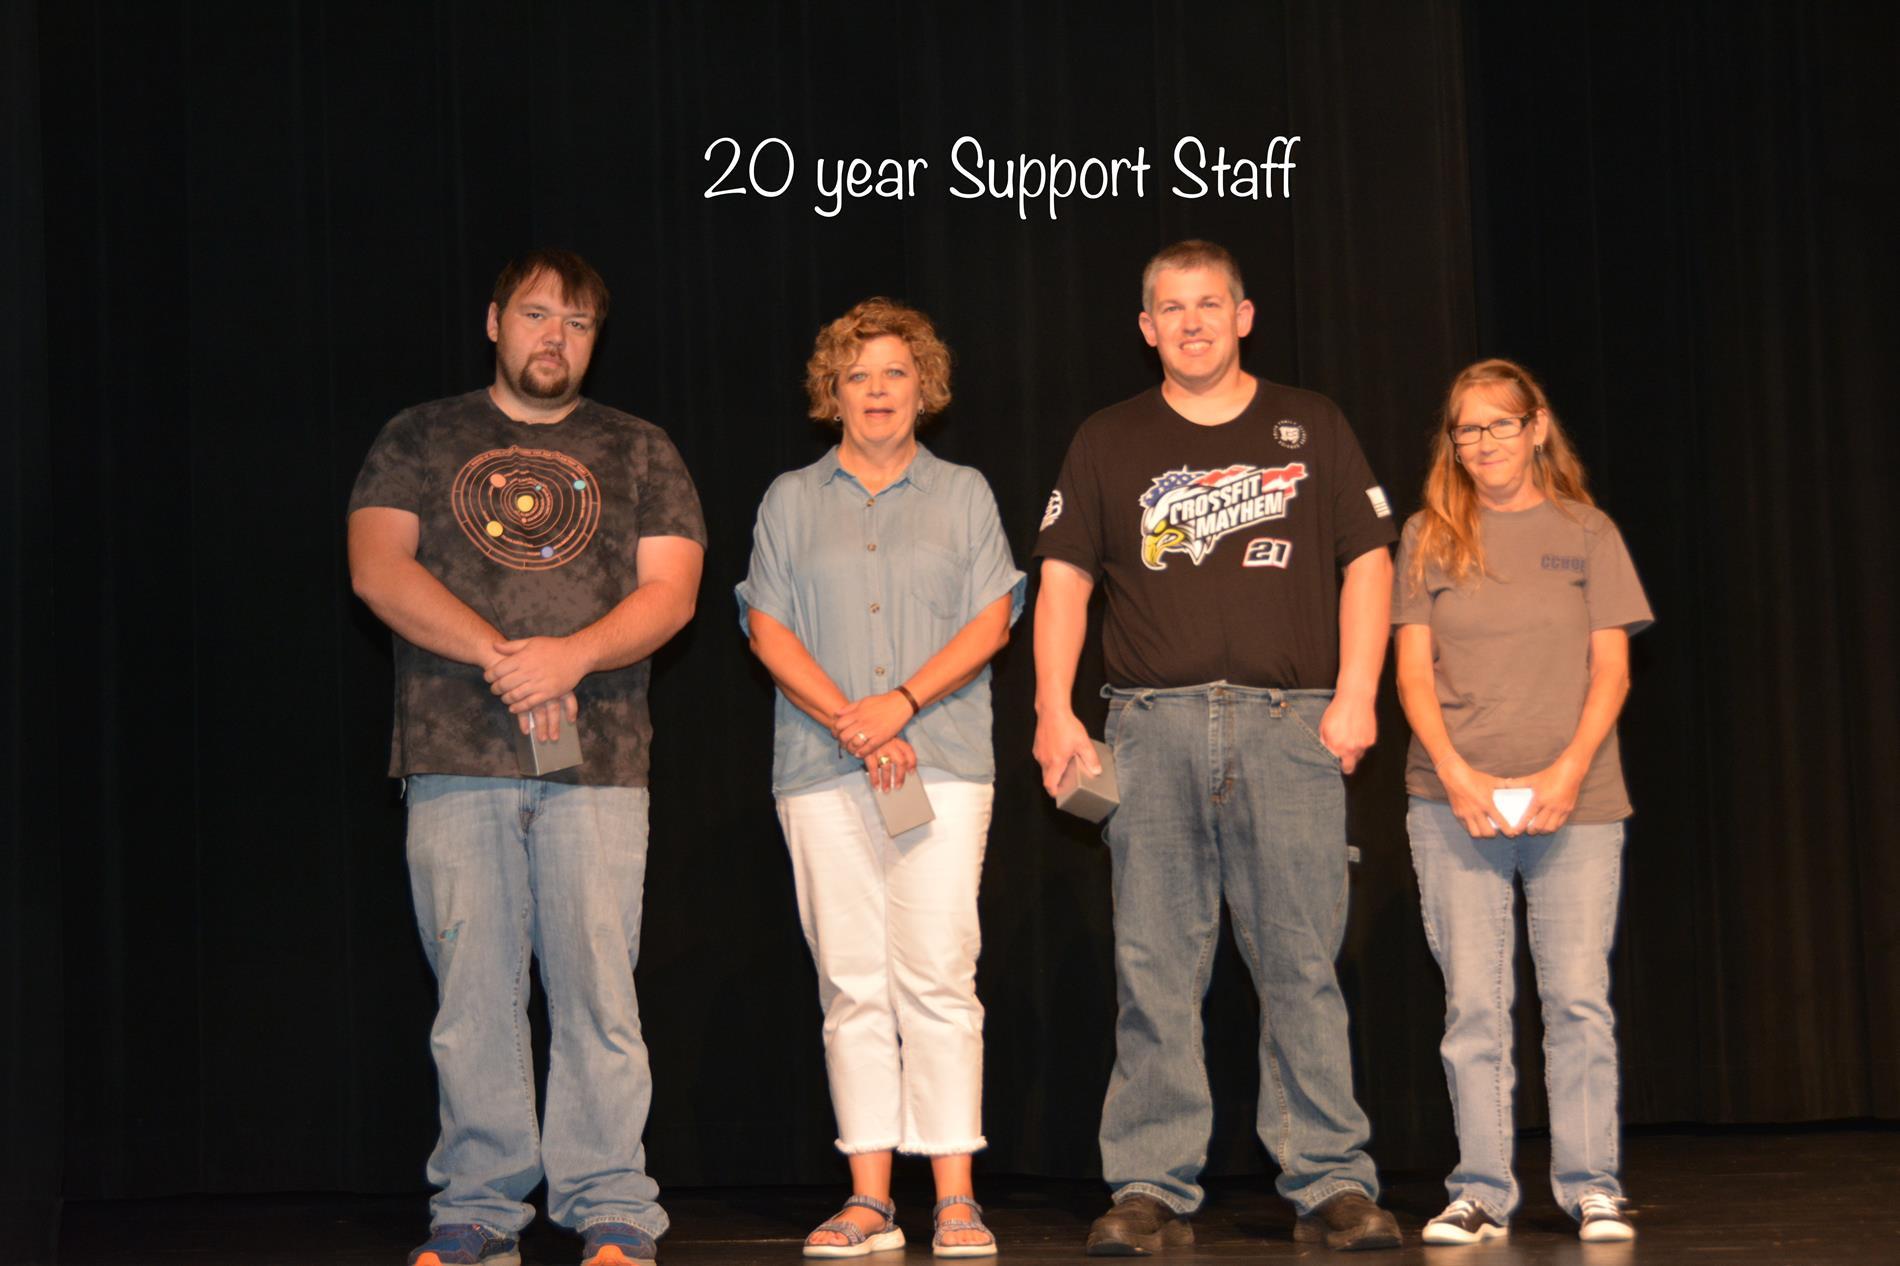 20 year Support Staff